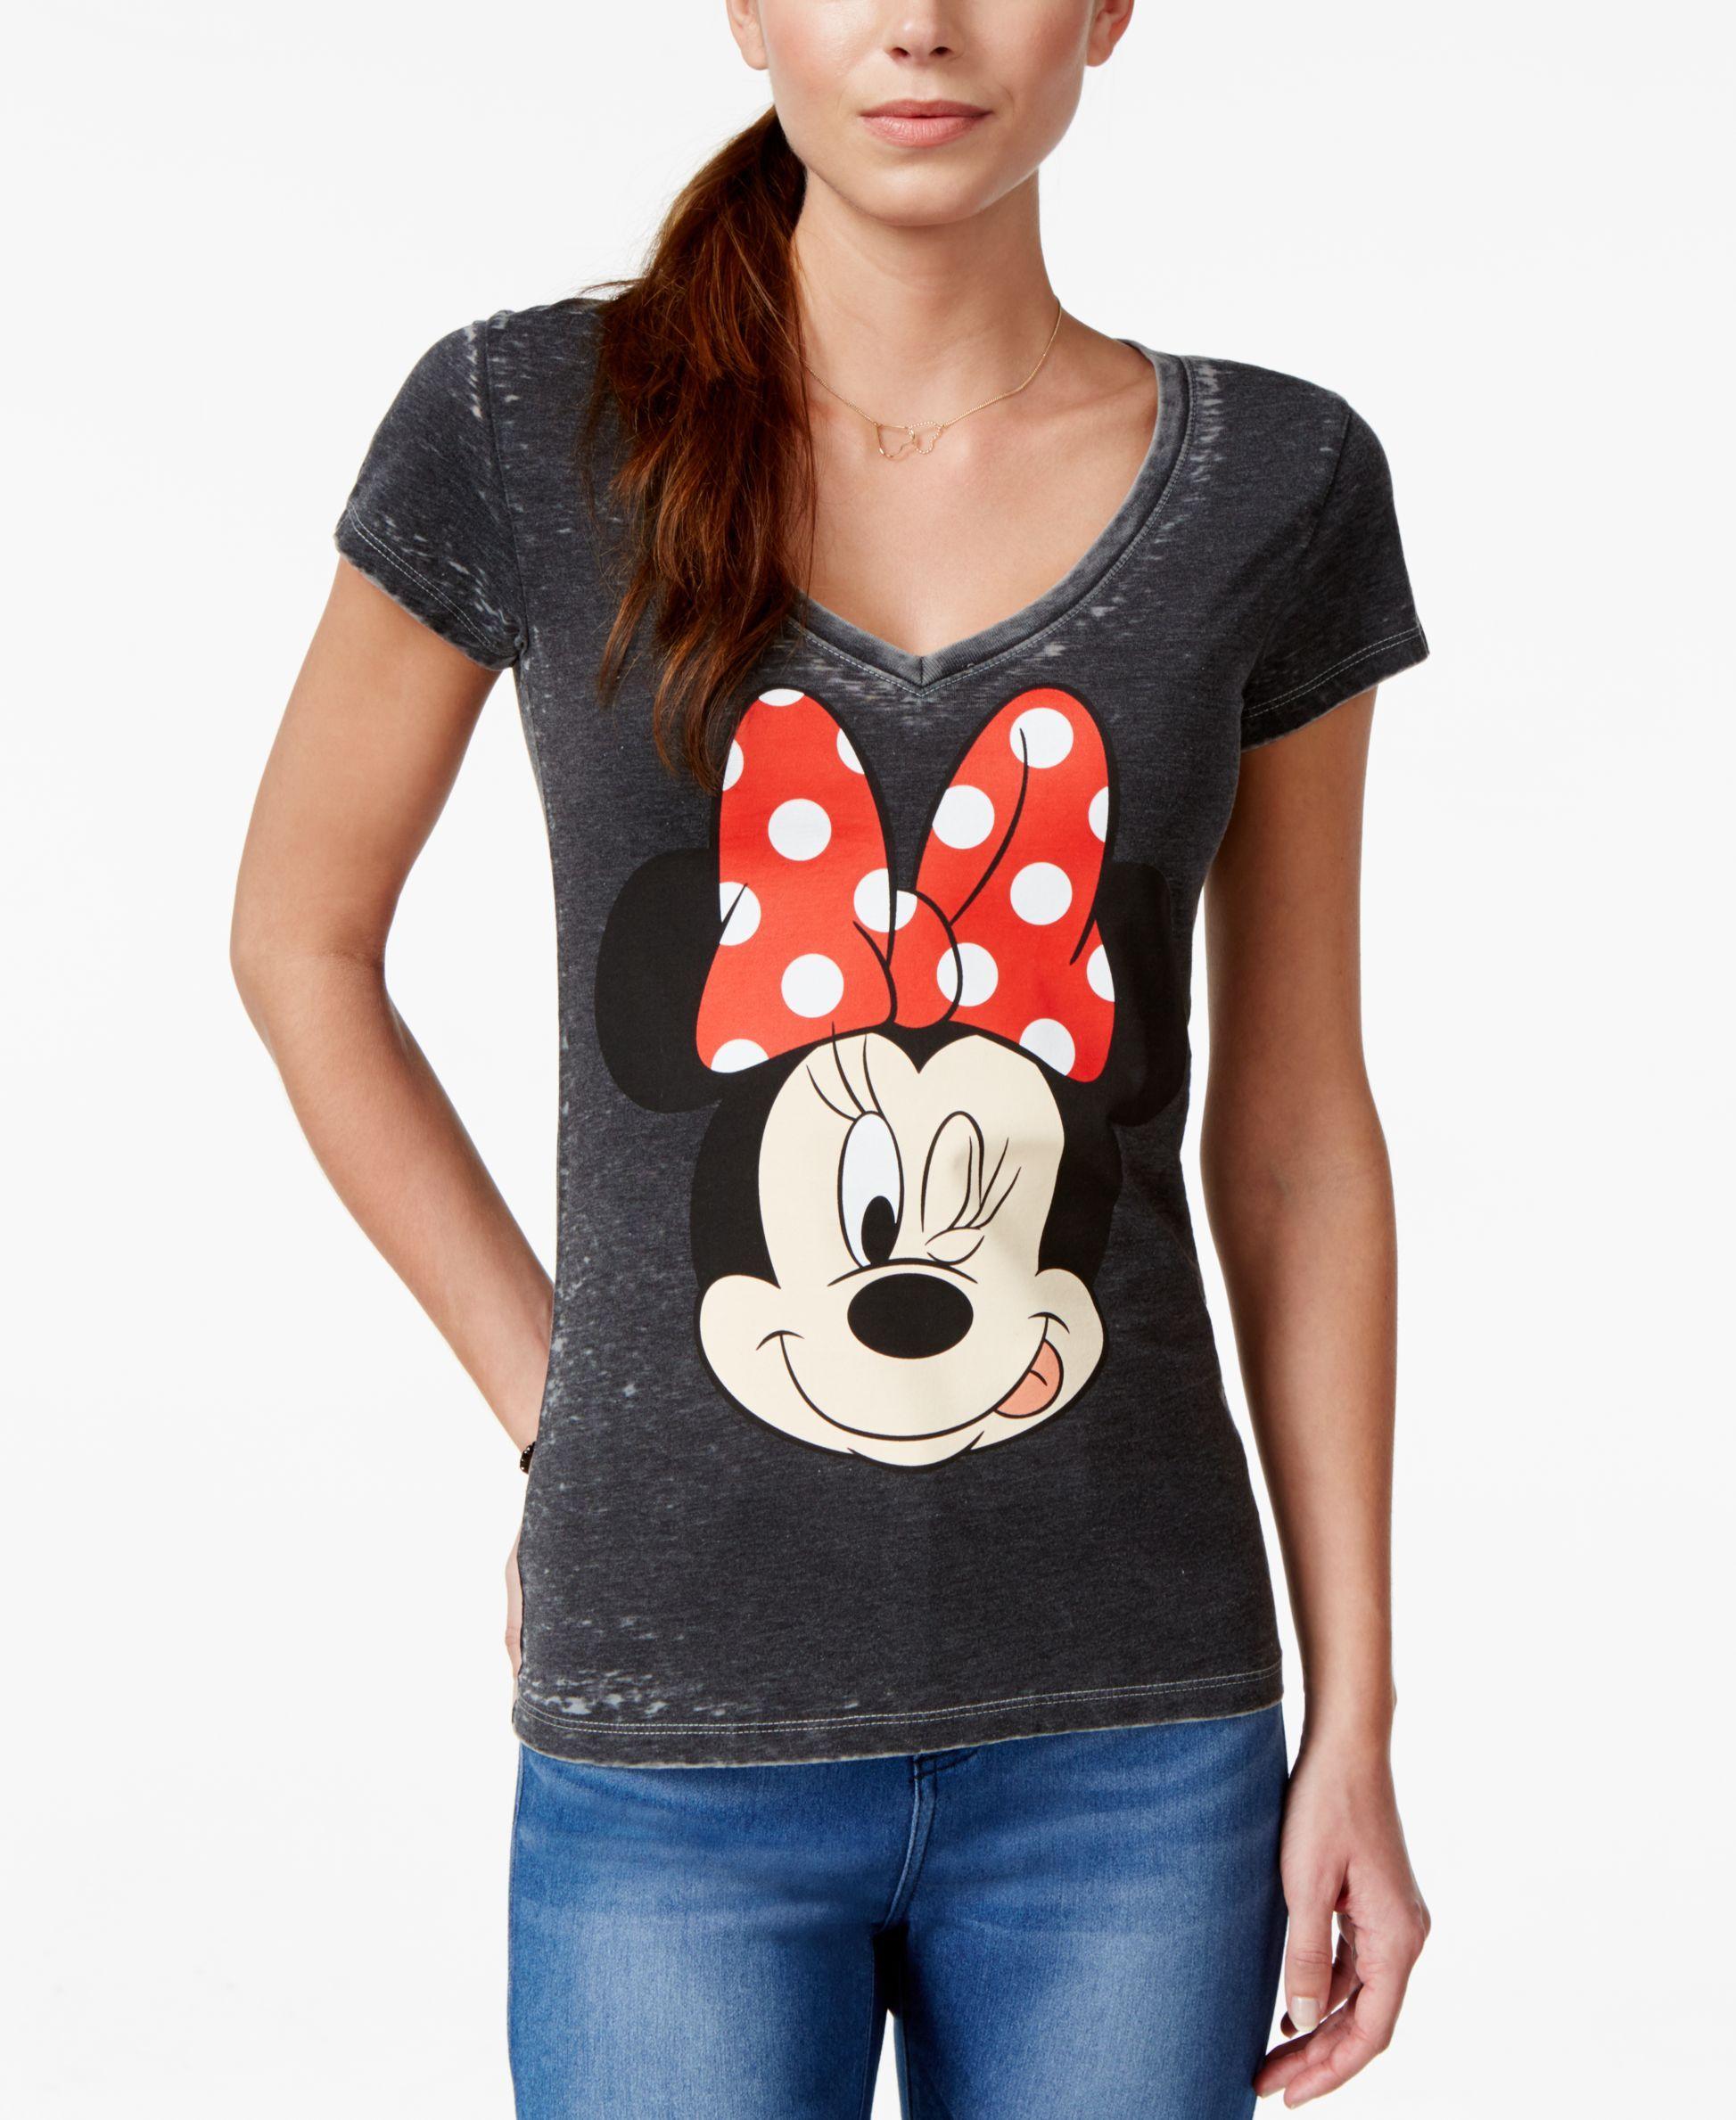 bb90665fae24 Hybrid uniors' Disney Minnie Mouse Wink Graphic T-Shirt | Disney ...